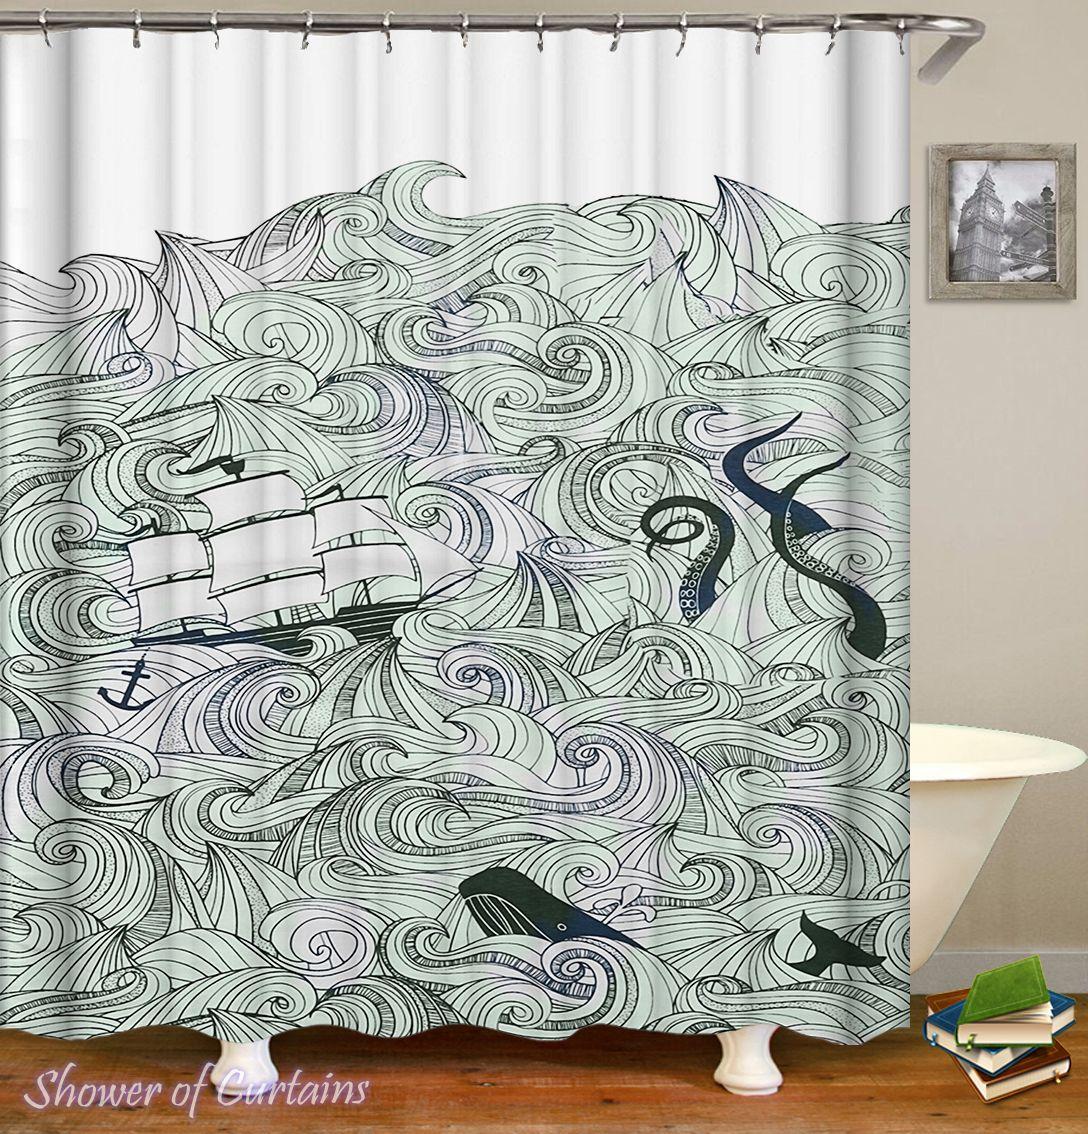 The Kraken Is Coming Shower Curtain - HXTC0374